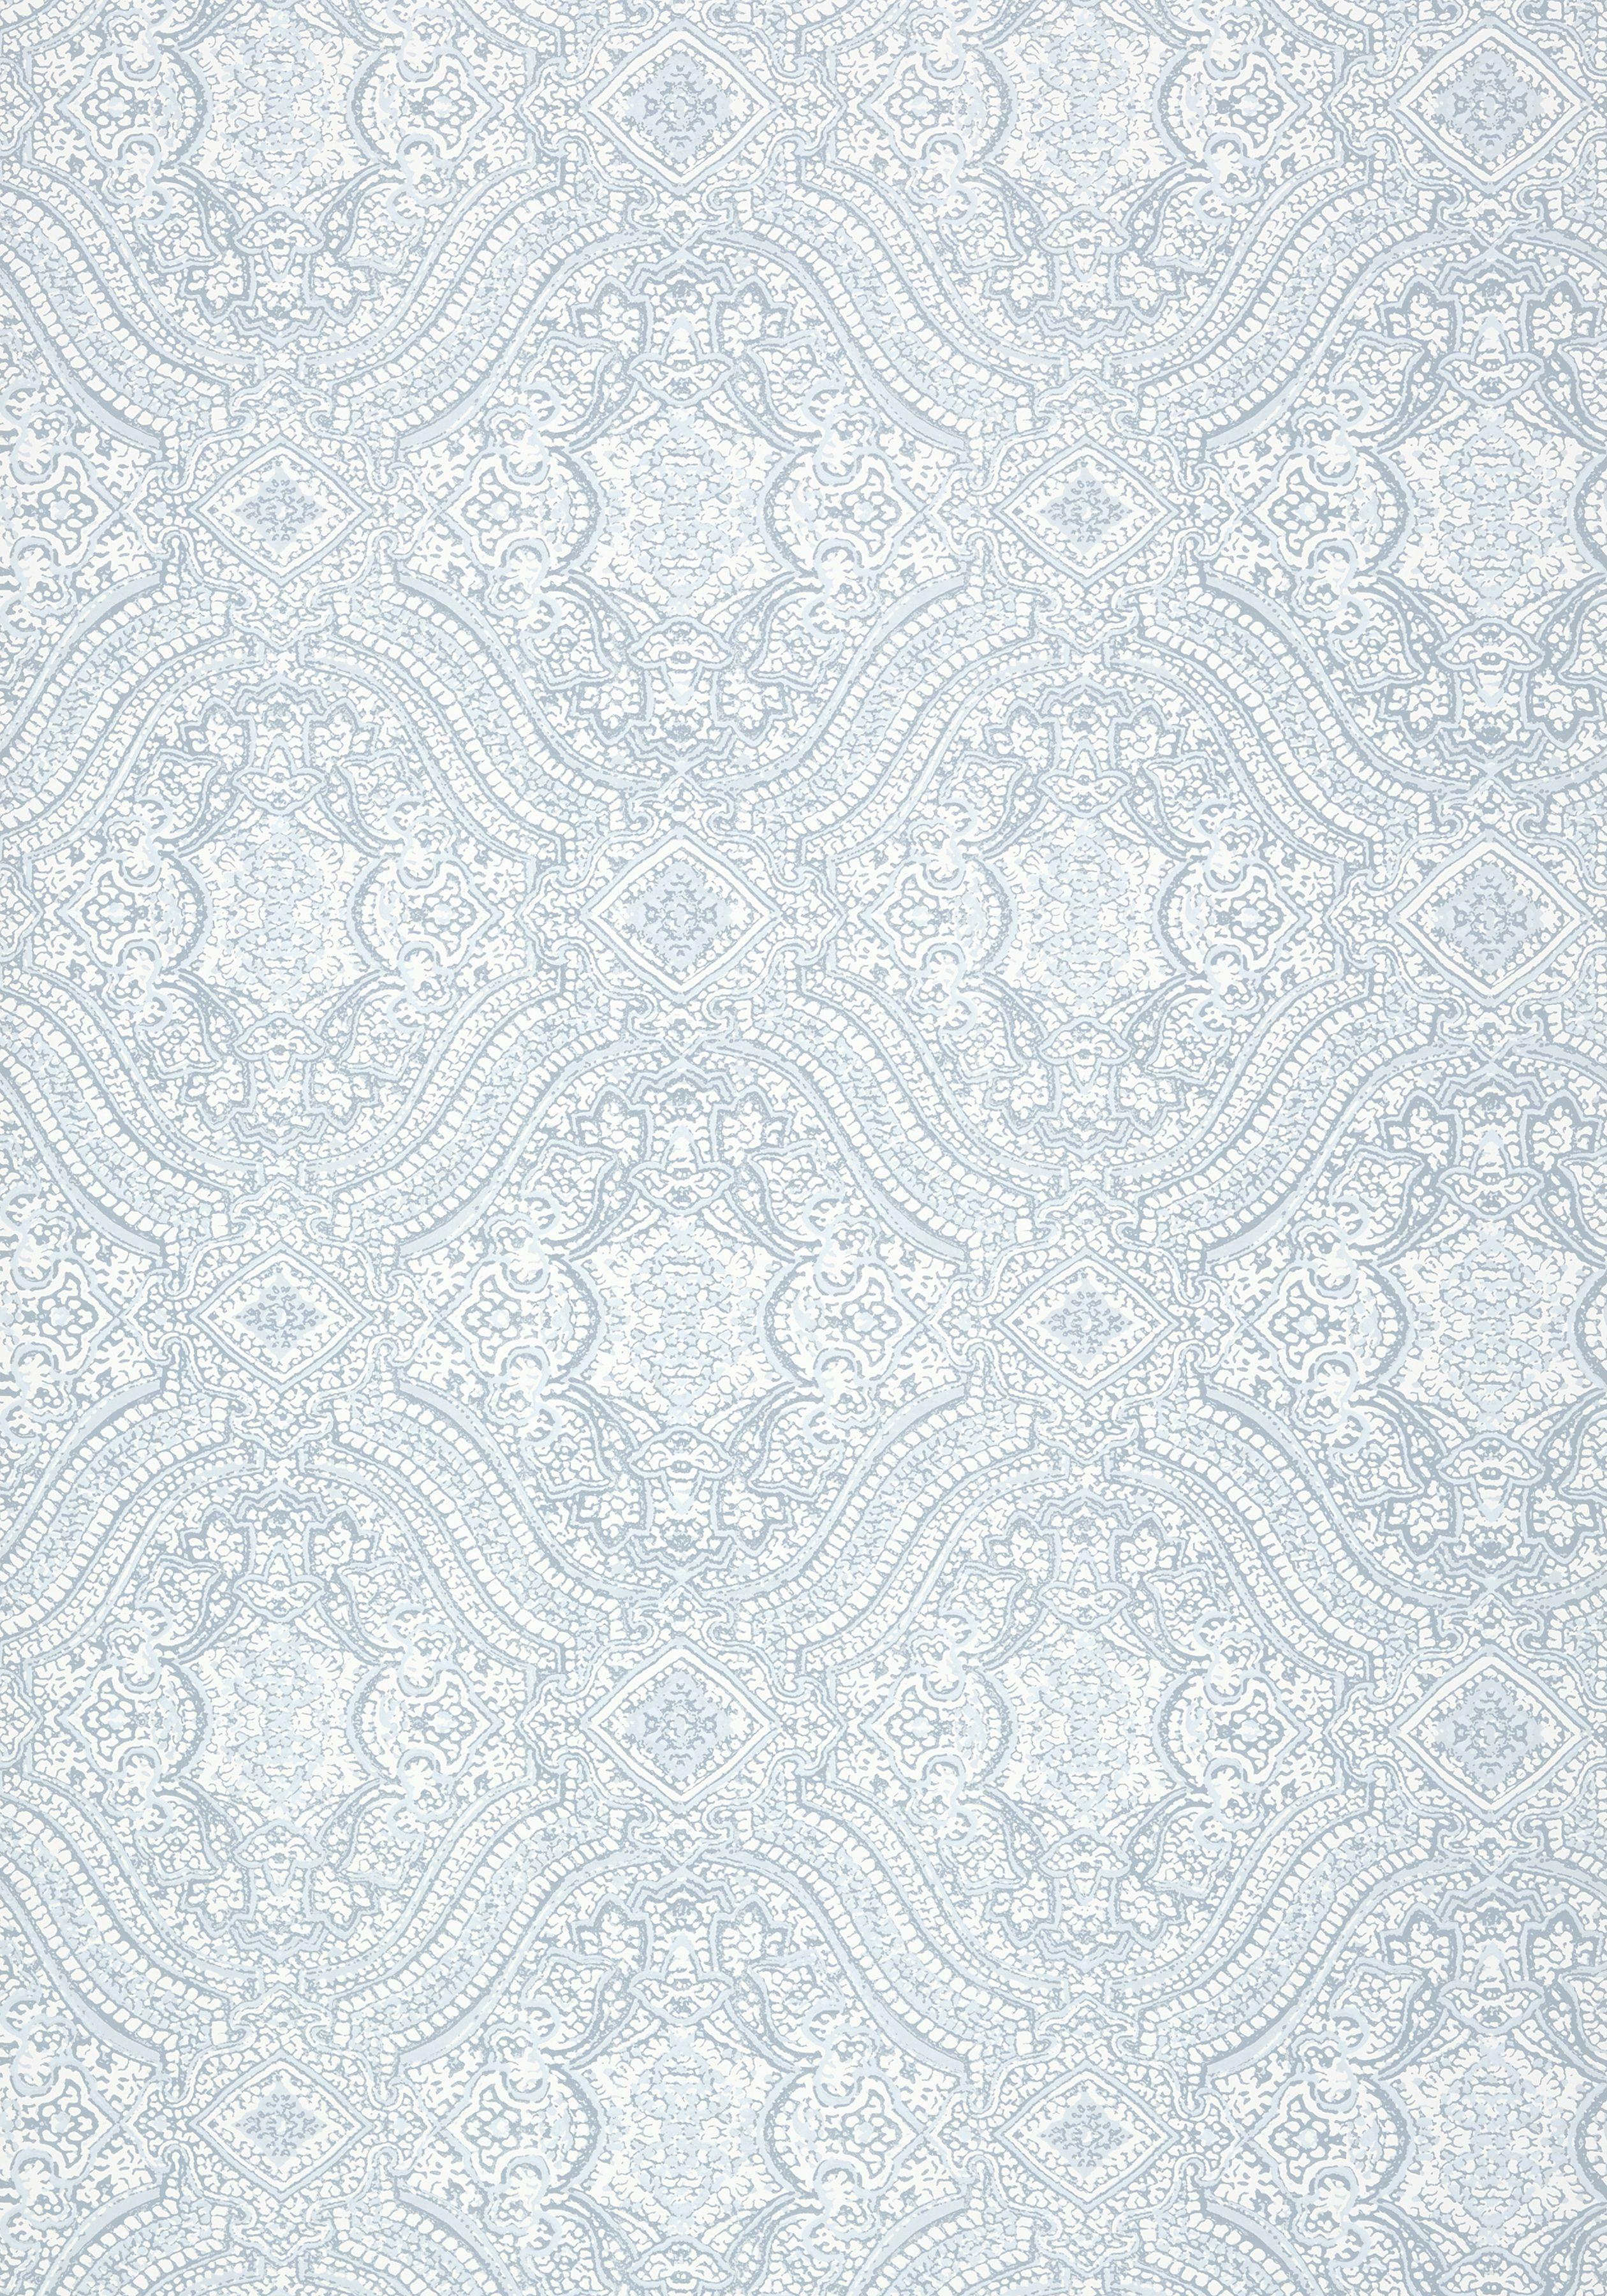 Block Print Wallpaper tulsi block print, aqua, t64165, collection caravan from thibaut